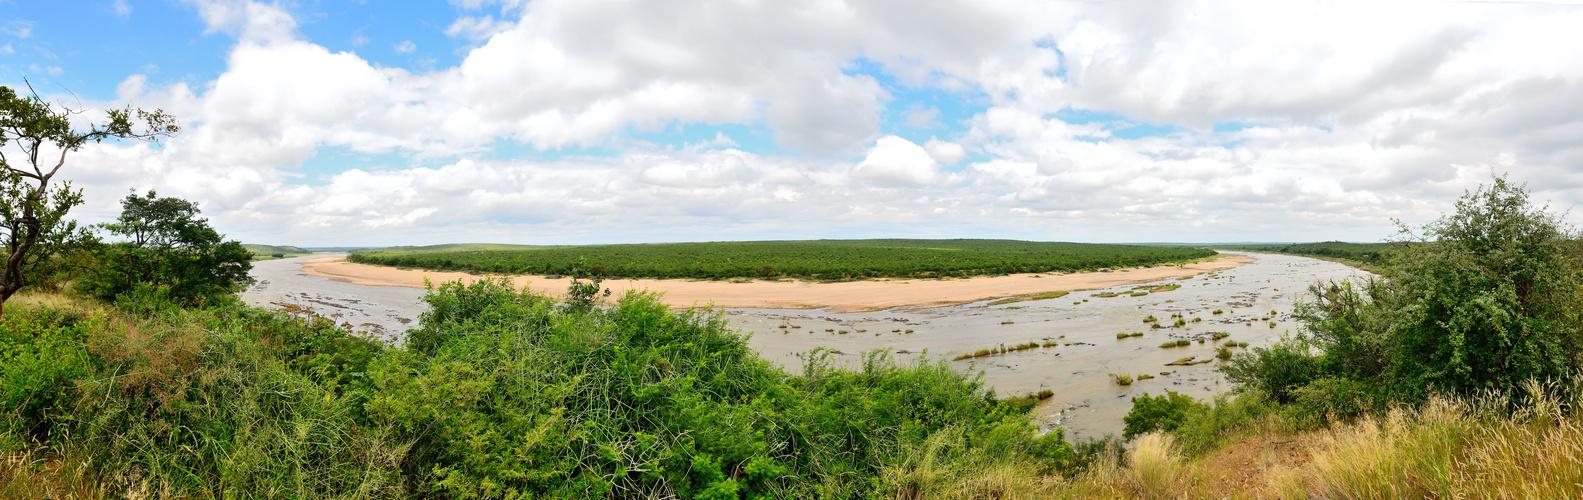 somewhere in Kruger Nationalpark - near Olifants Camp...